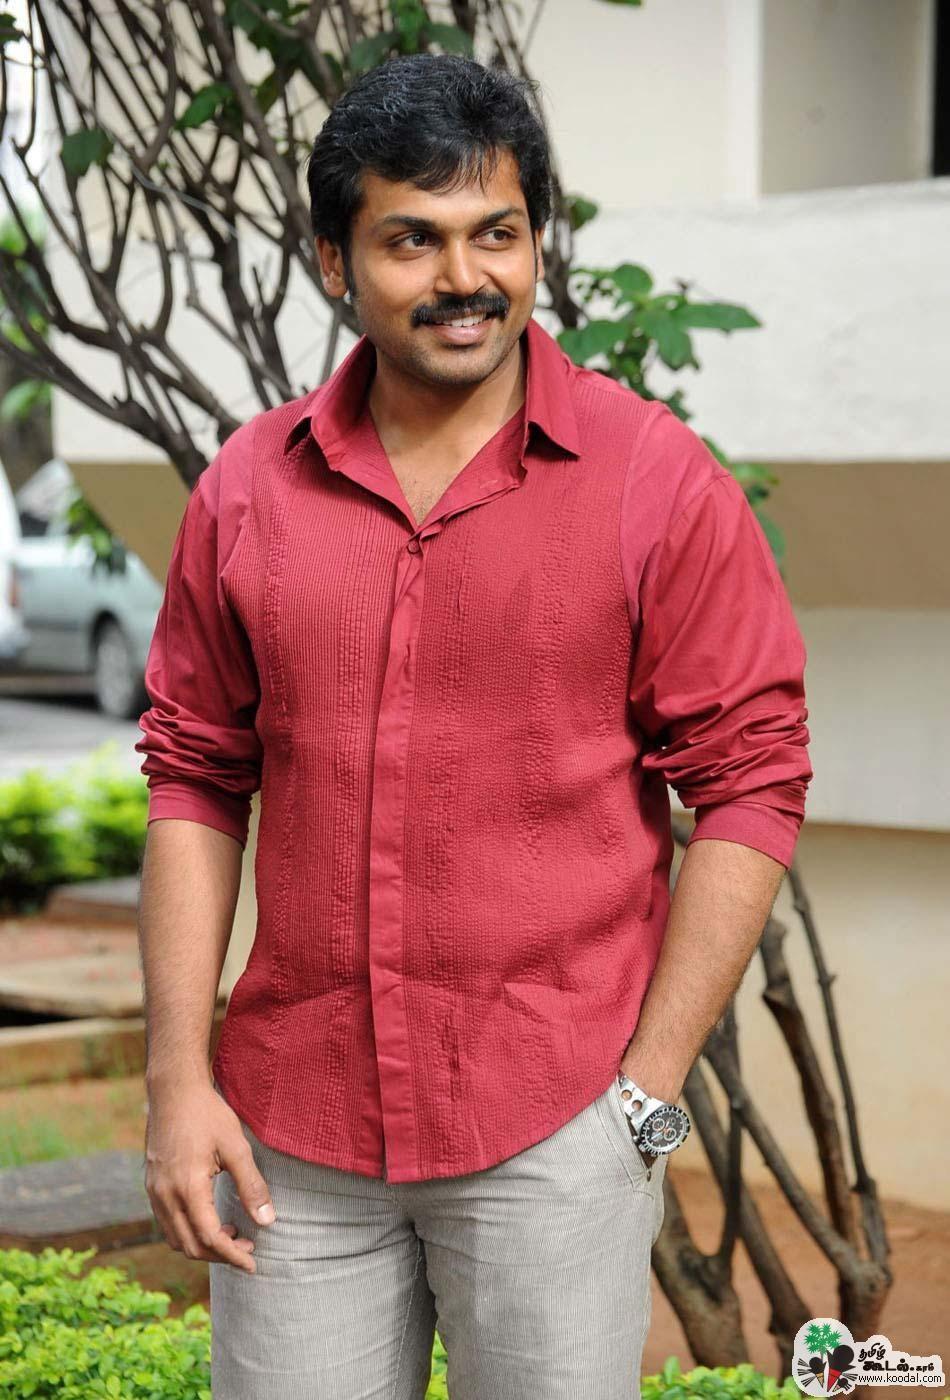 Karthi Actor Karthi Latest Images Actor Karthi Latest Pictures